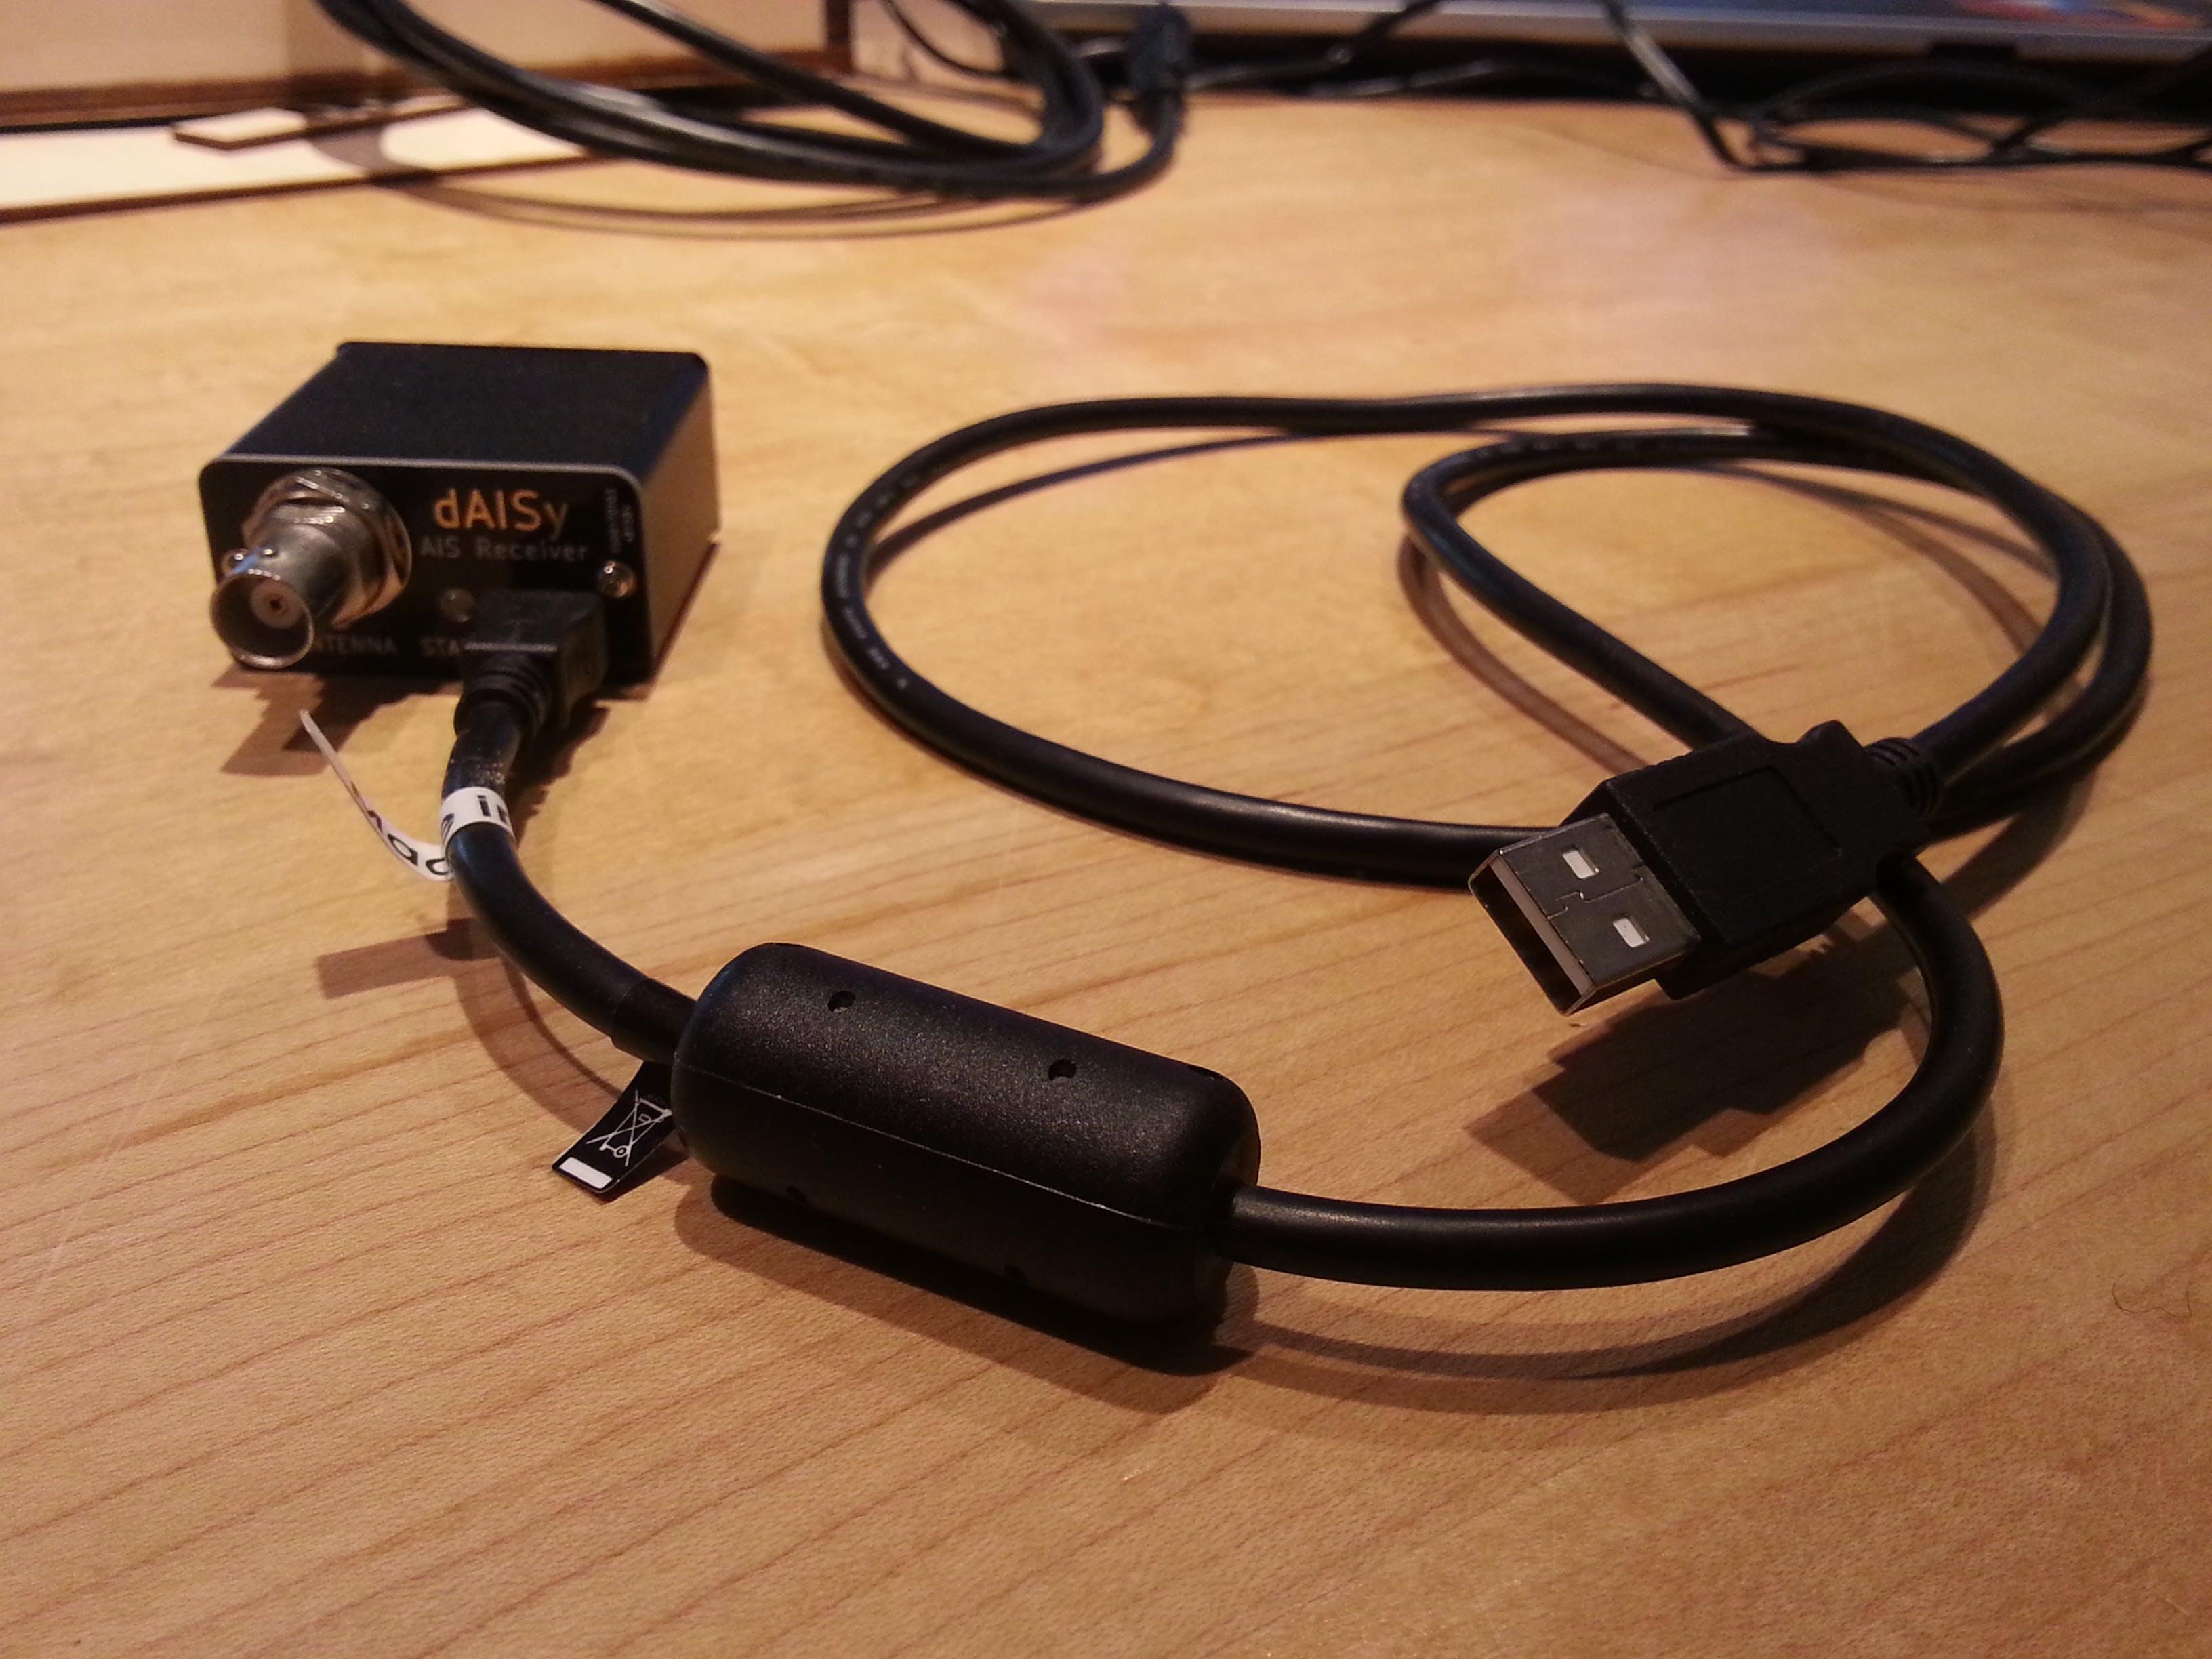 Tiny dAISy AIS receiver from Adrian Studer